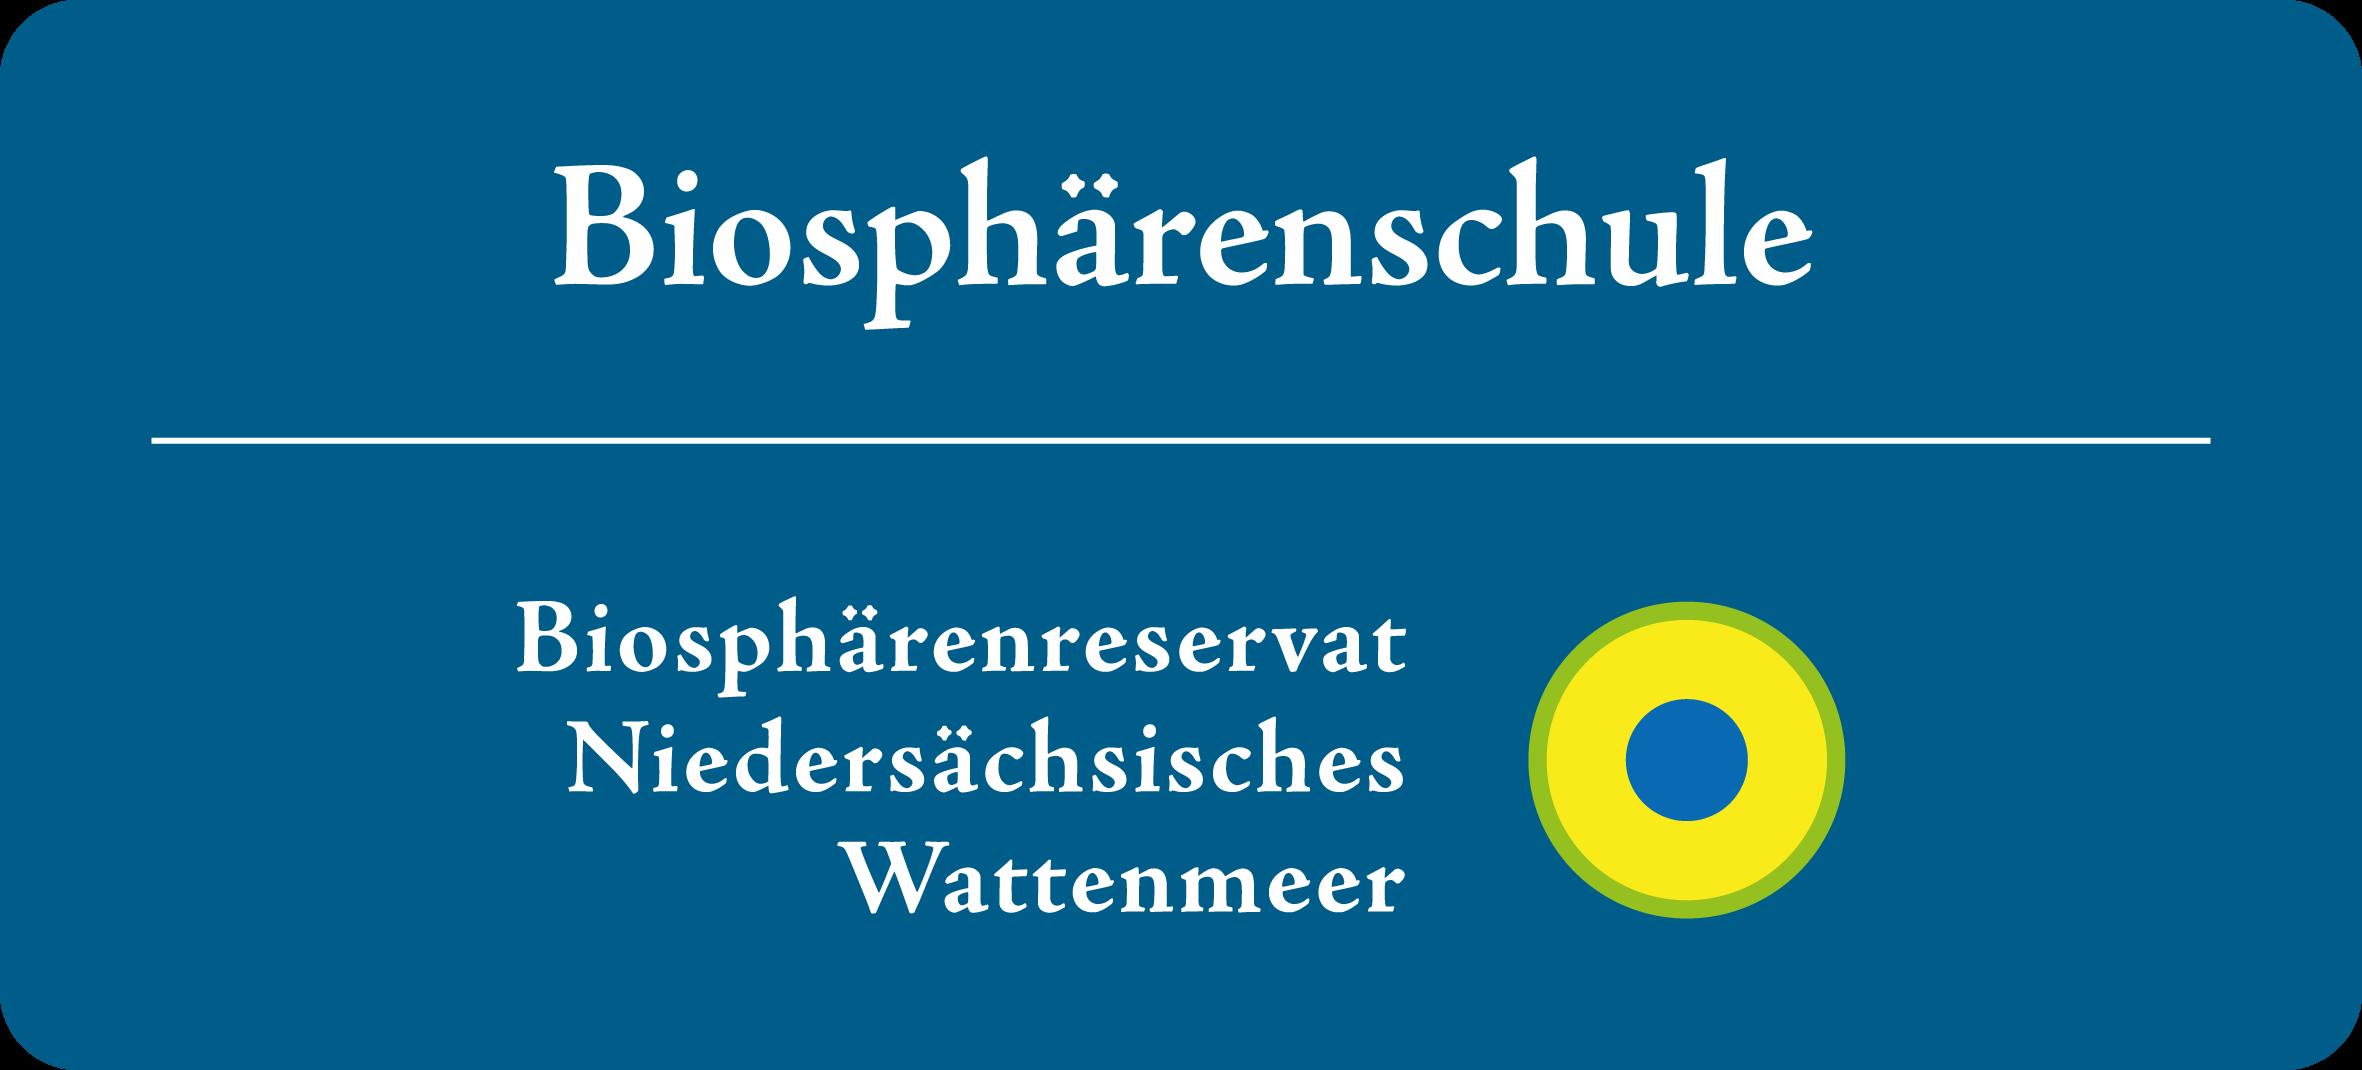 Schild Biosphärenschule Niedersachsen